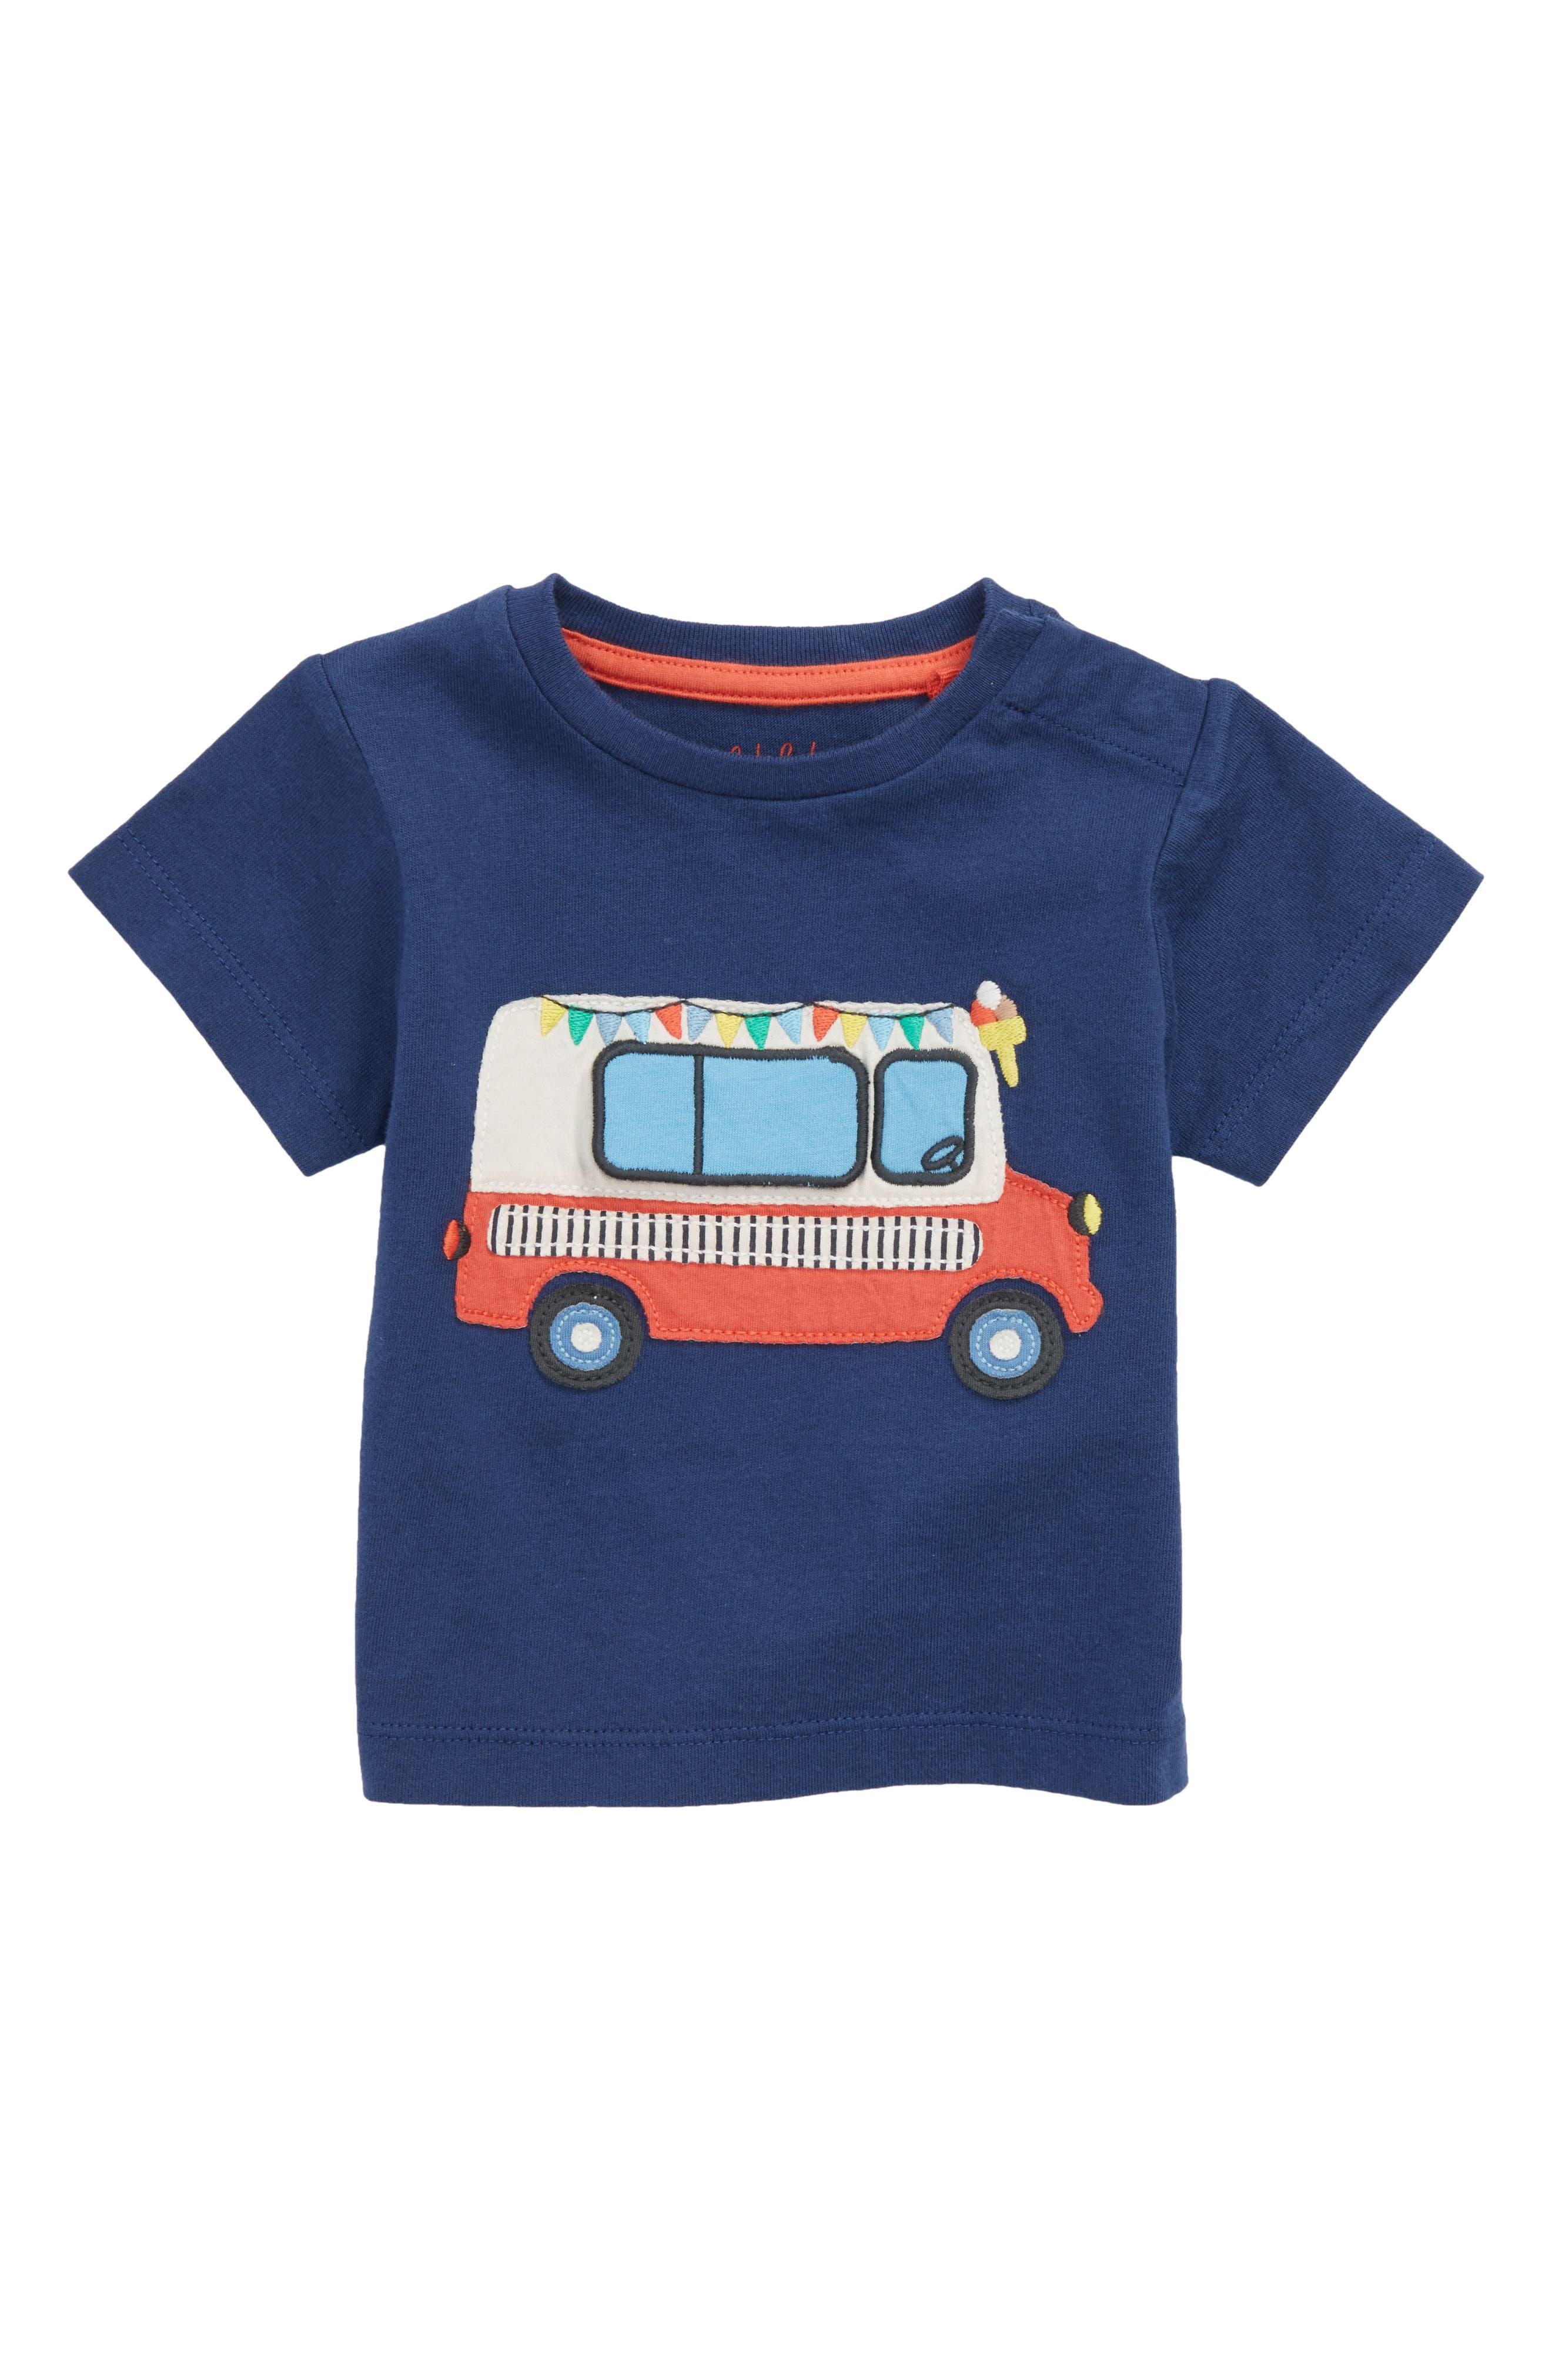 Peekaboo T-Shirt,                         Main,                         color, Beacon Blue